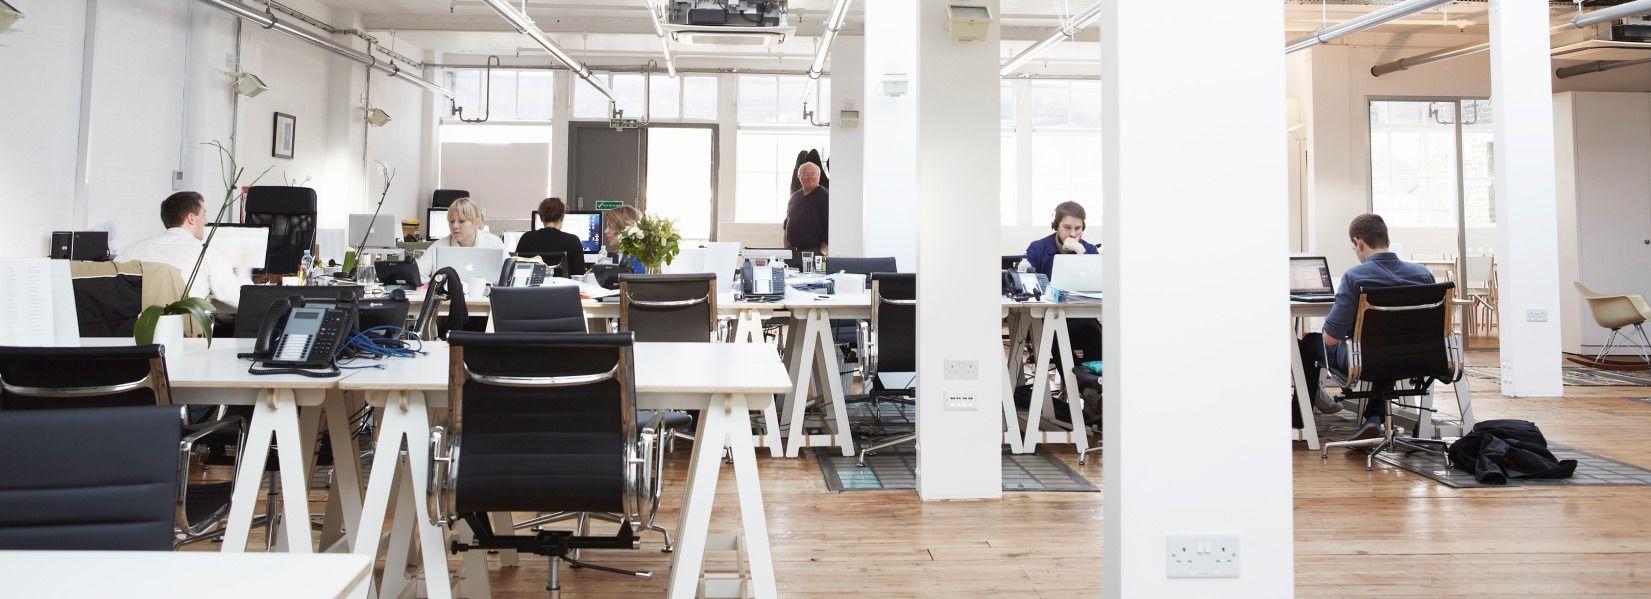 escritorios de oficina para cowork